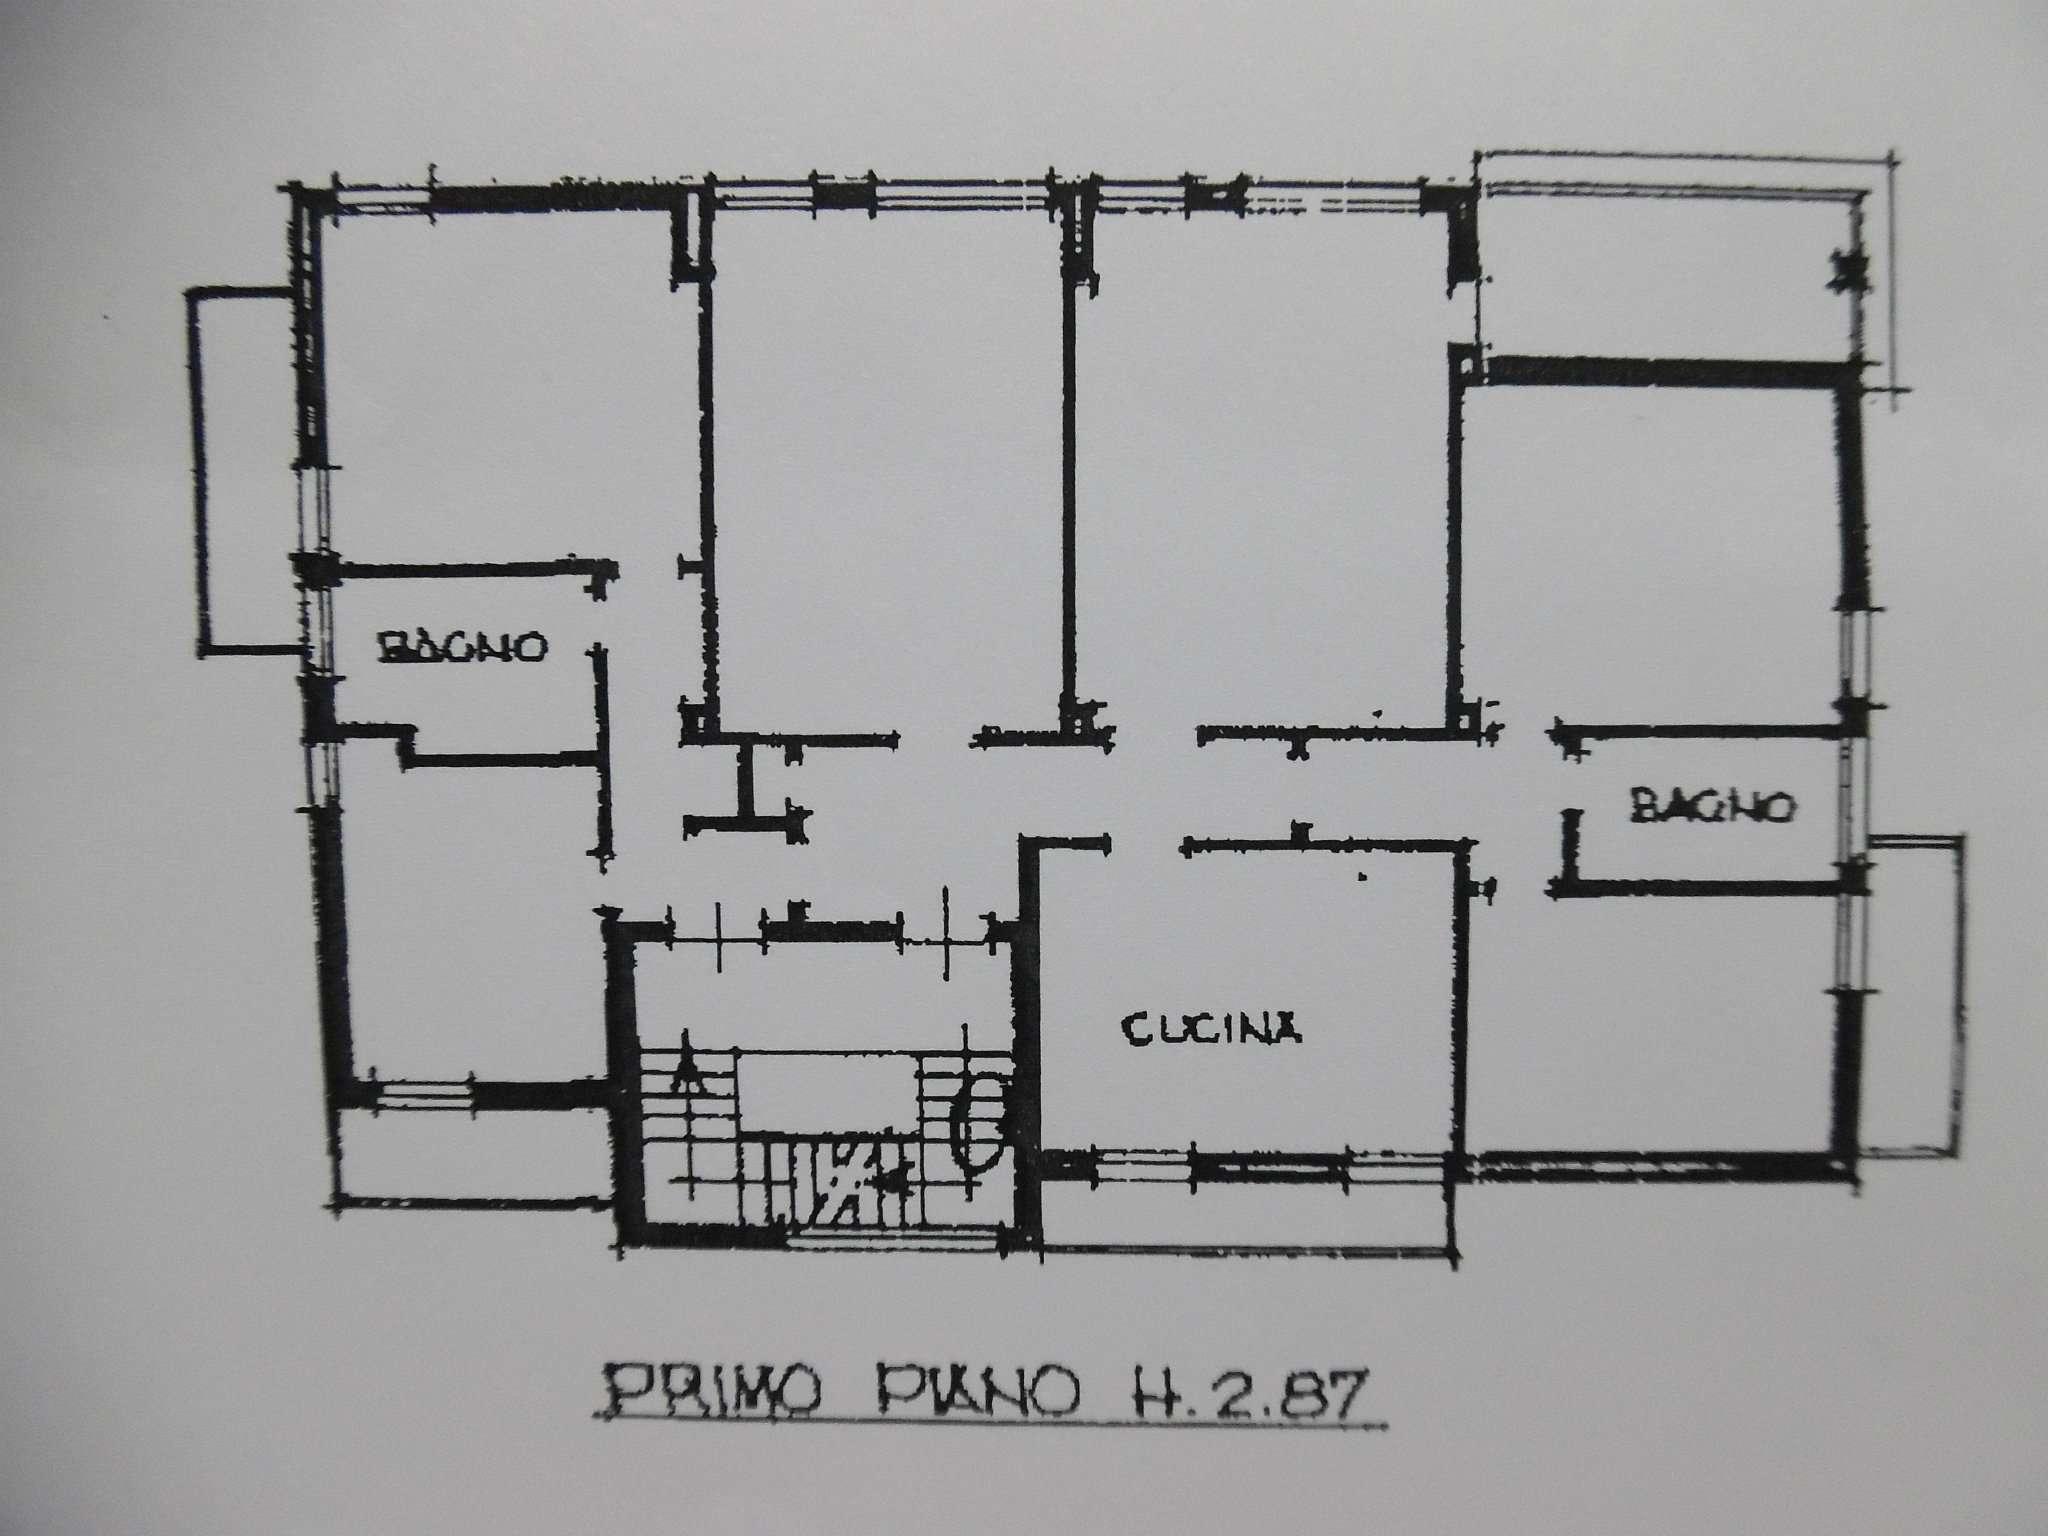 Appartamento, roma, Vendita - Camugnano